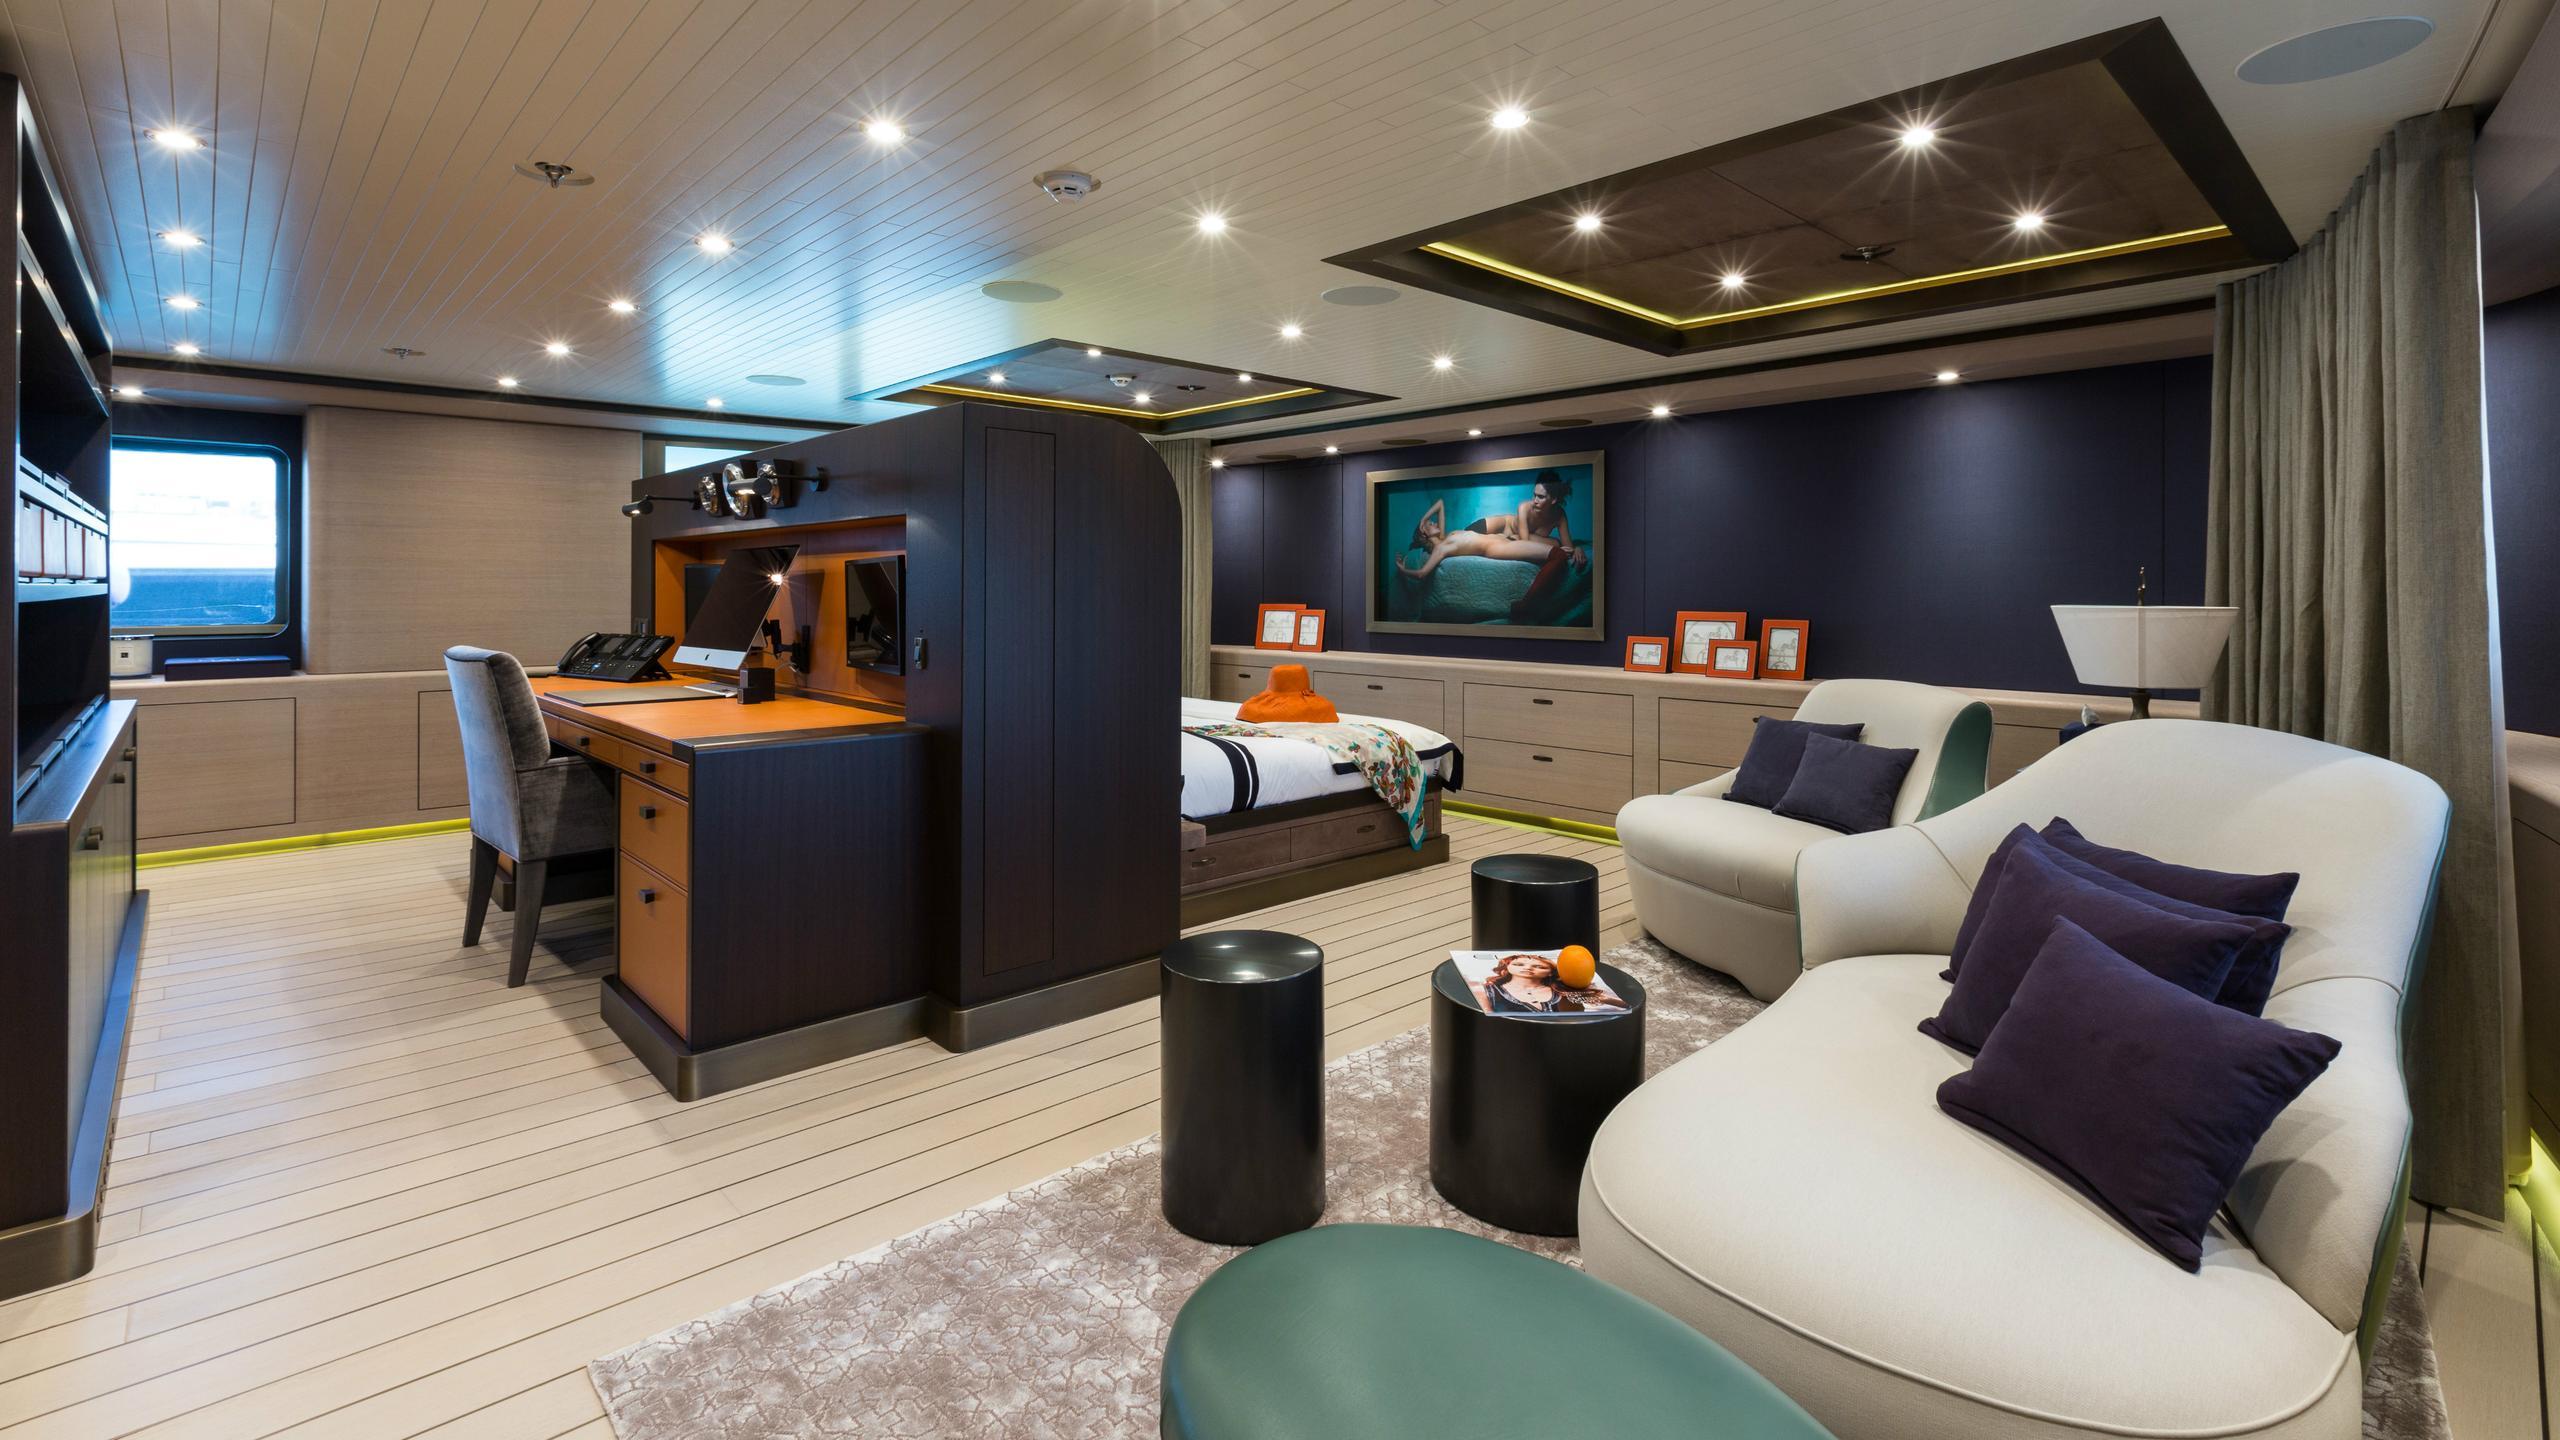 gene-machine-motor-yacht-amels-le-180-2013-55m-master-cabin